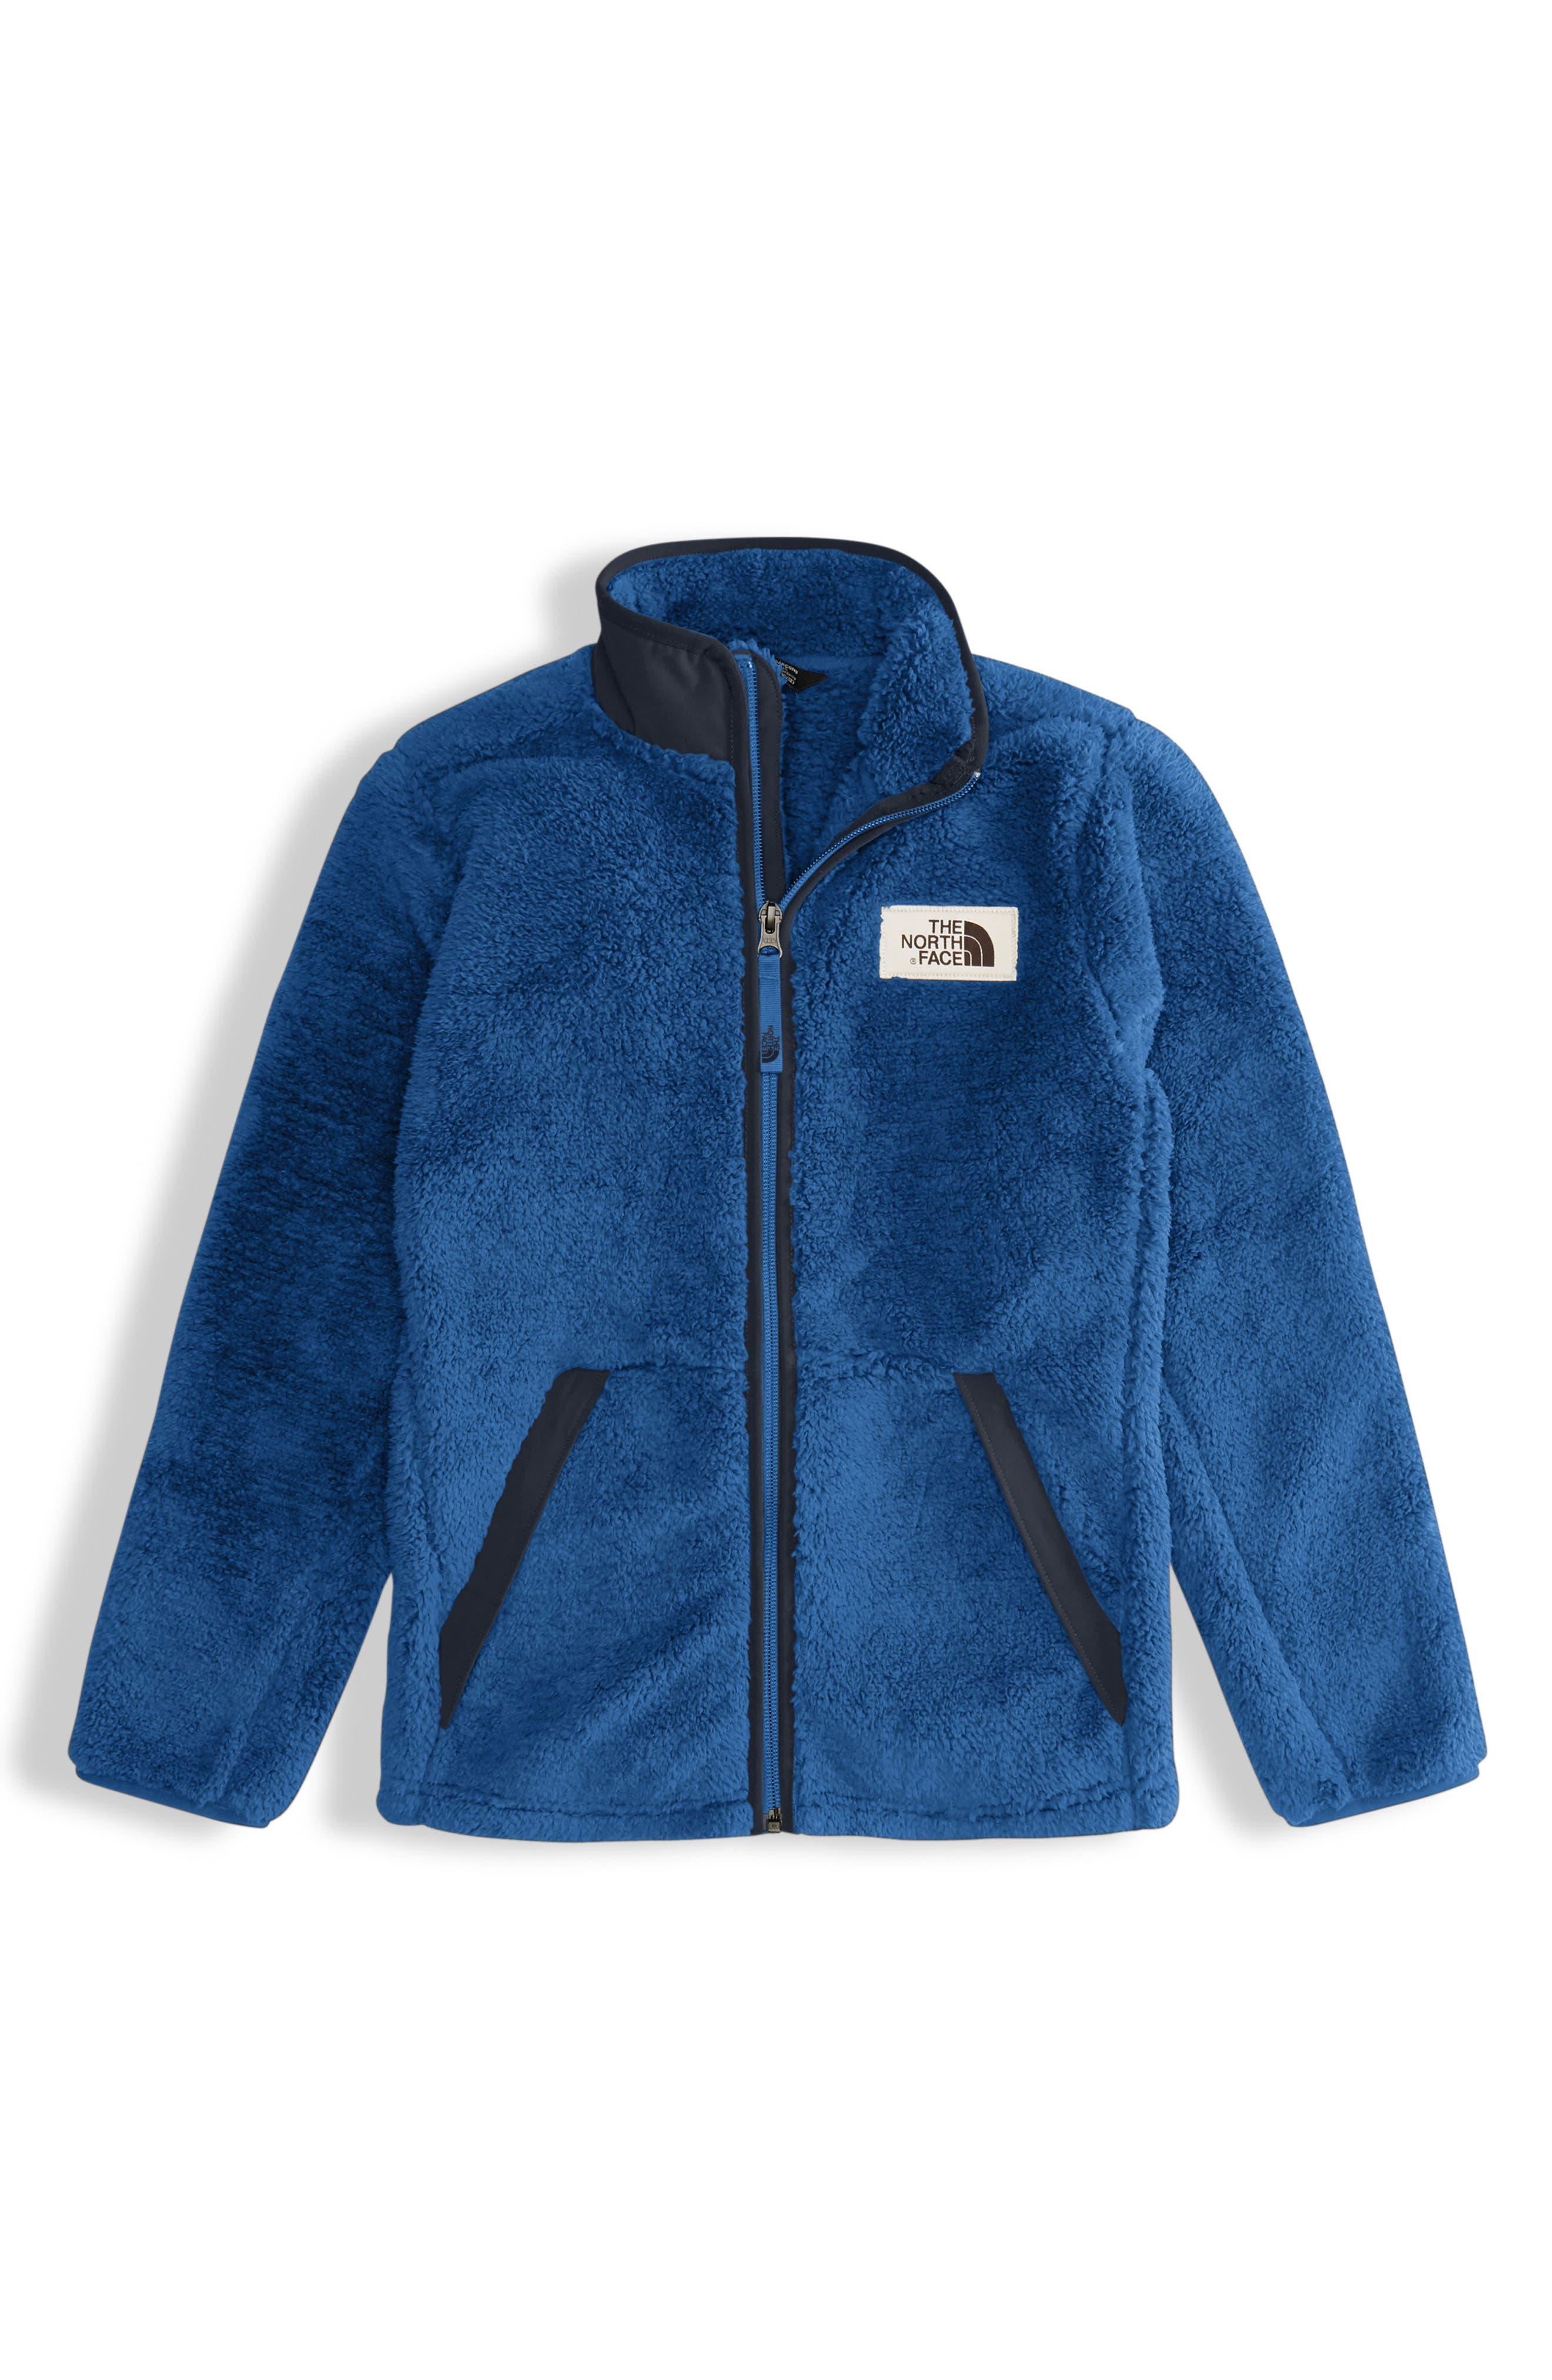 Campshire Full Zip Jacket,                             Main thumbnail 1, color,                             SHADY BLUE